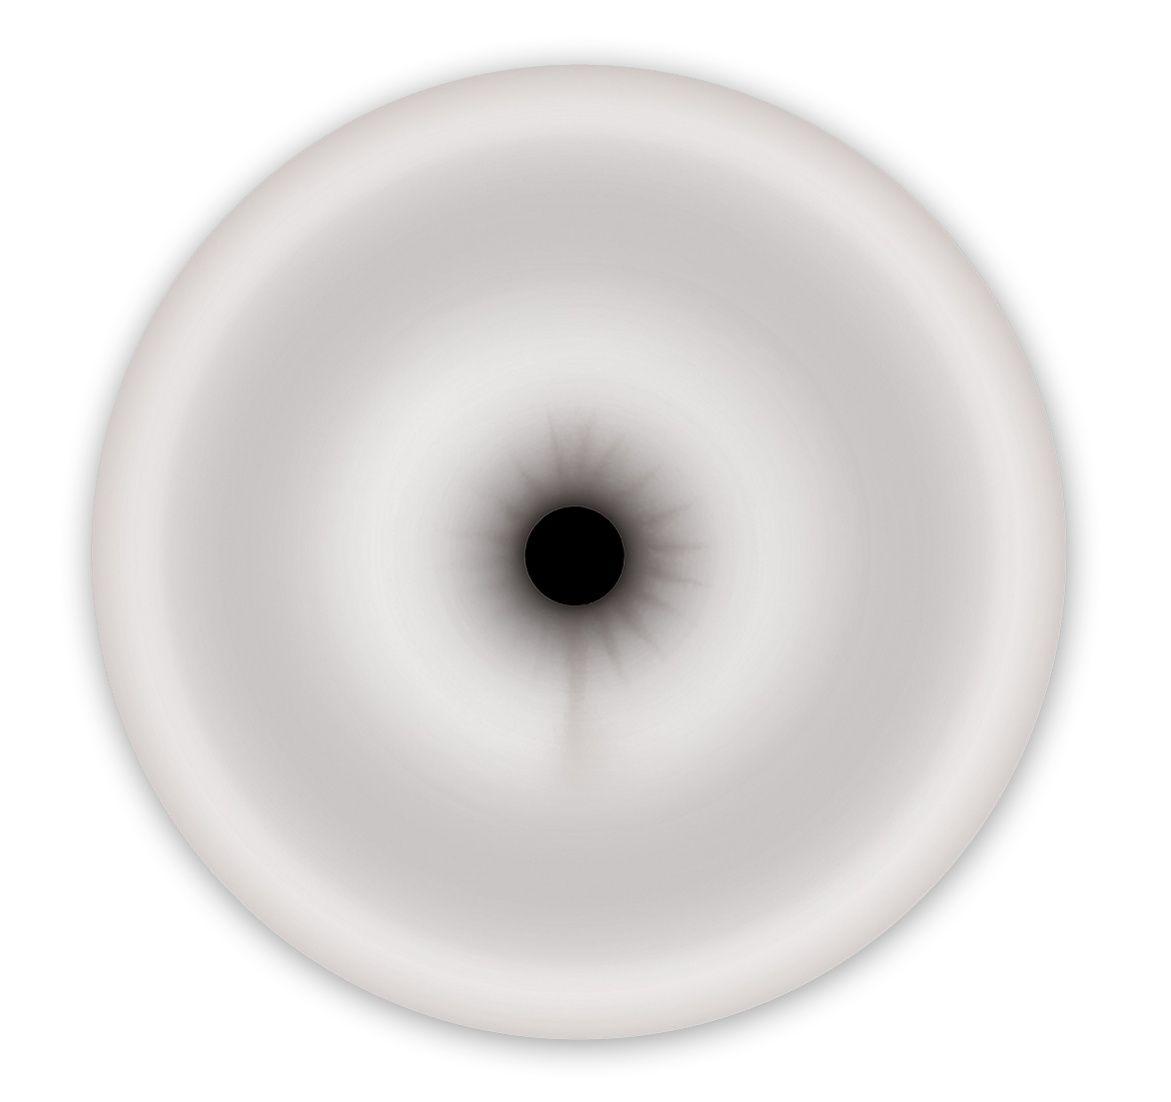 Насадка-уплотнитель на помпу Universal Pump Sleeve Ass - фото 254094